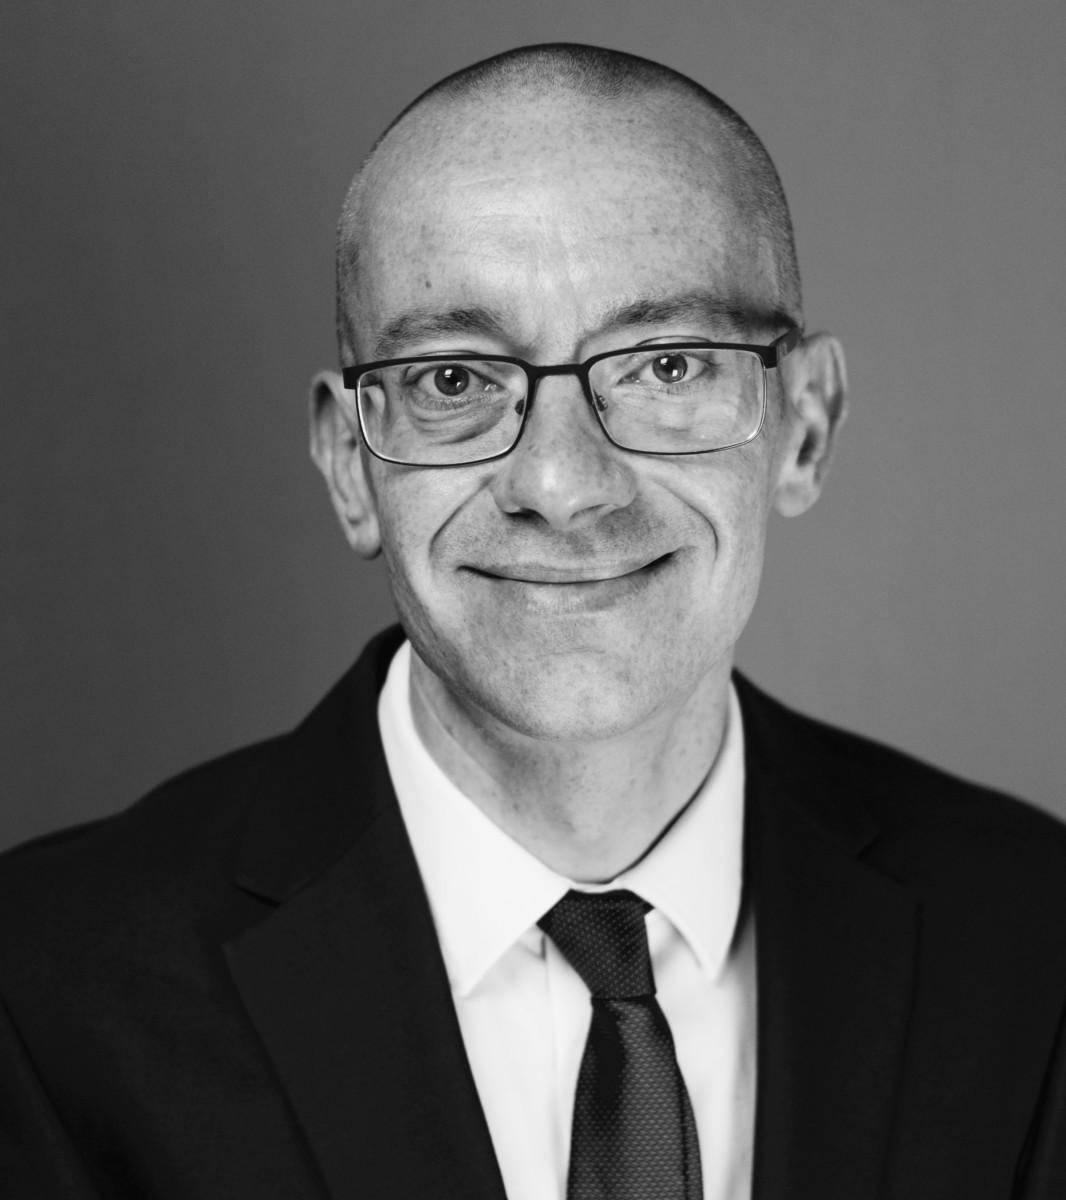 Alex Wakefield BA (Hons) Cert CII ACILA FIFAA  Executive Adjuster, Private Clients McLarens Private Clients